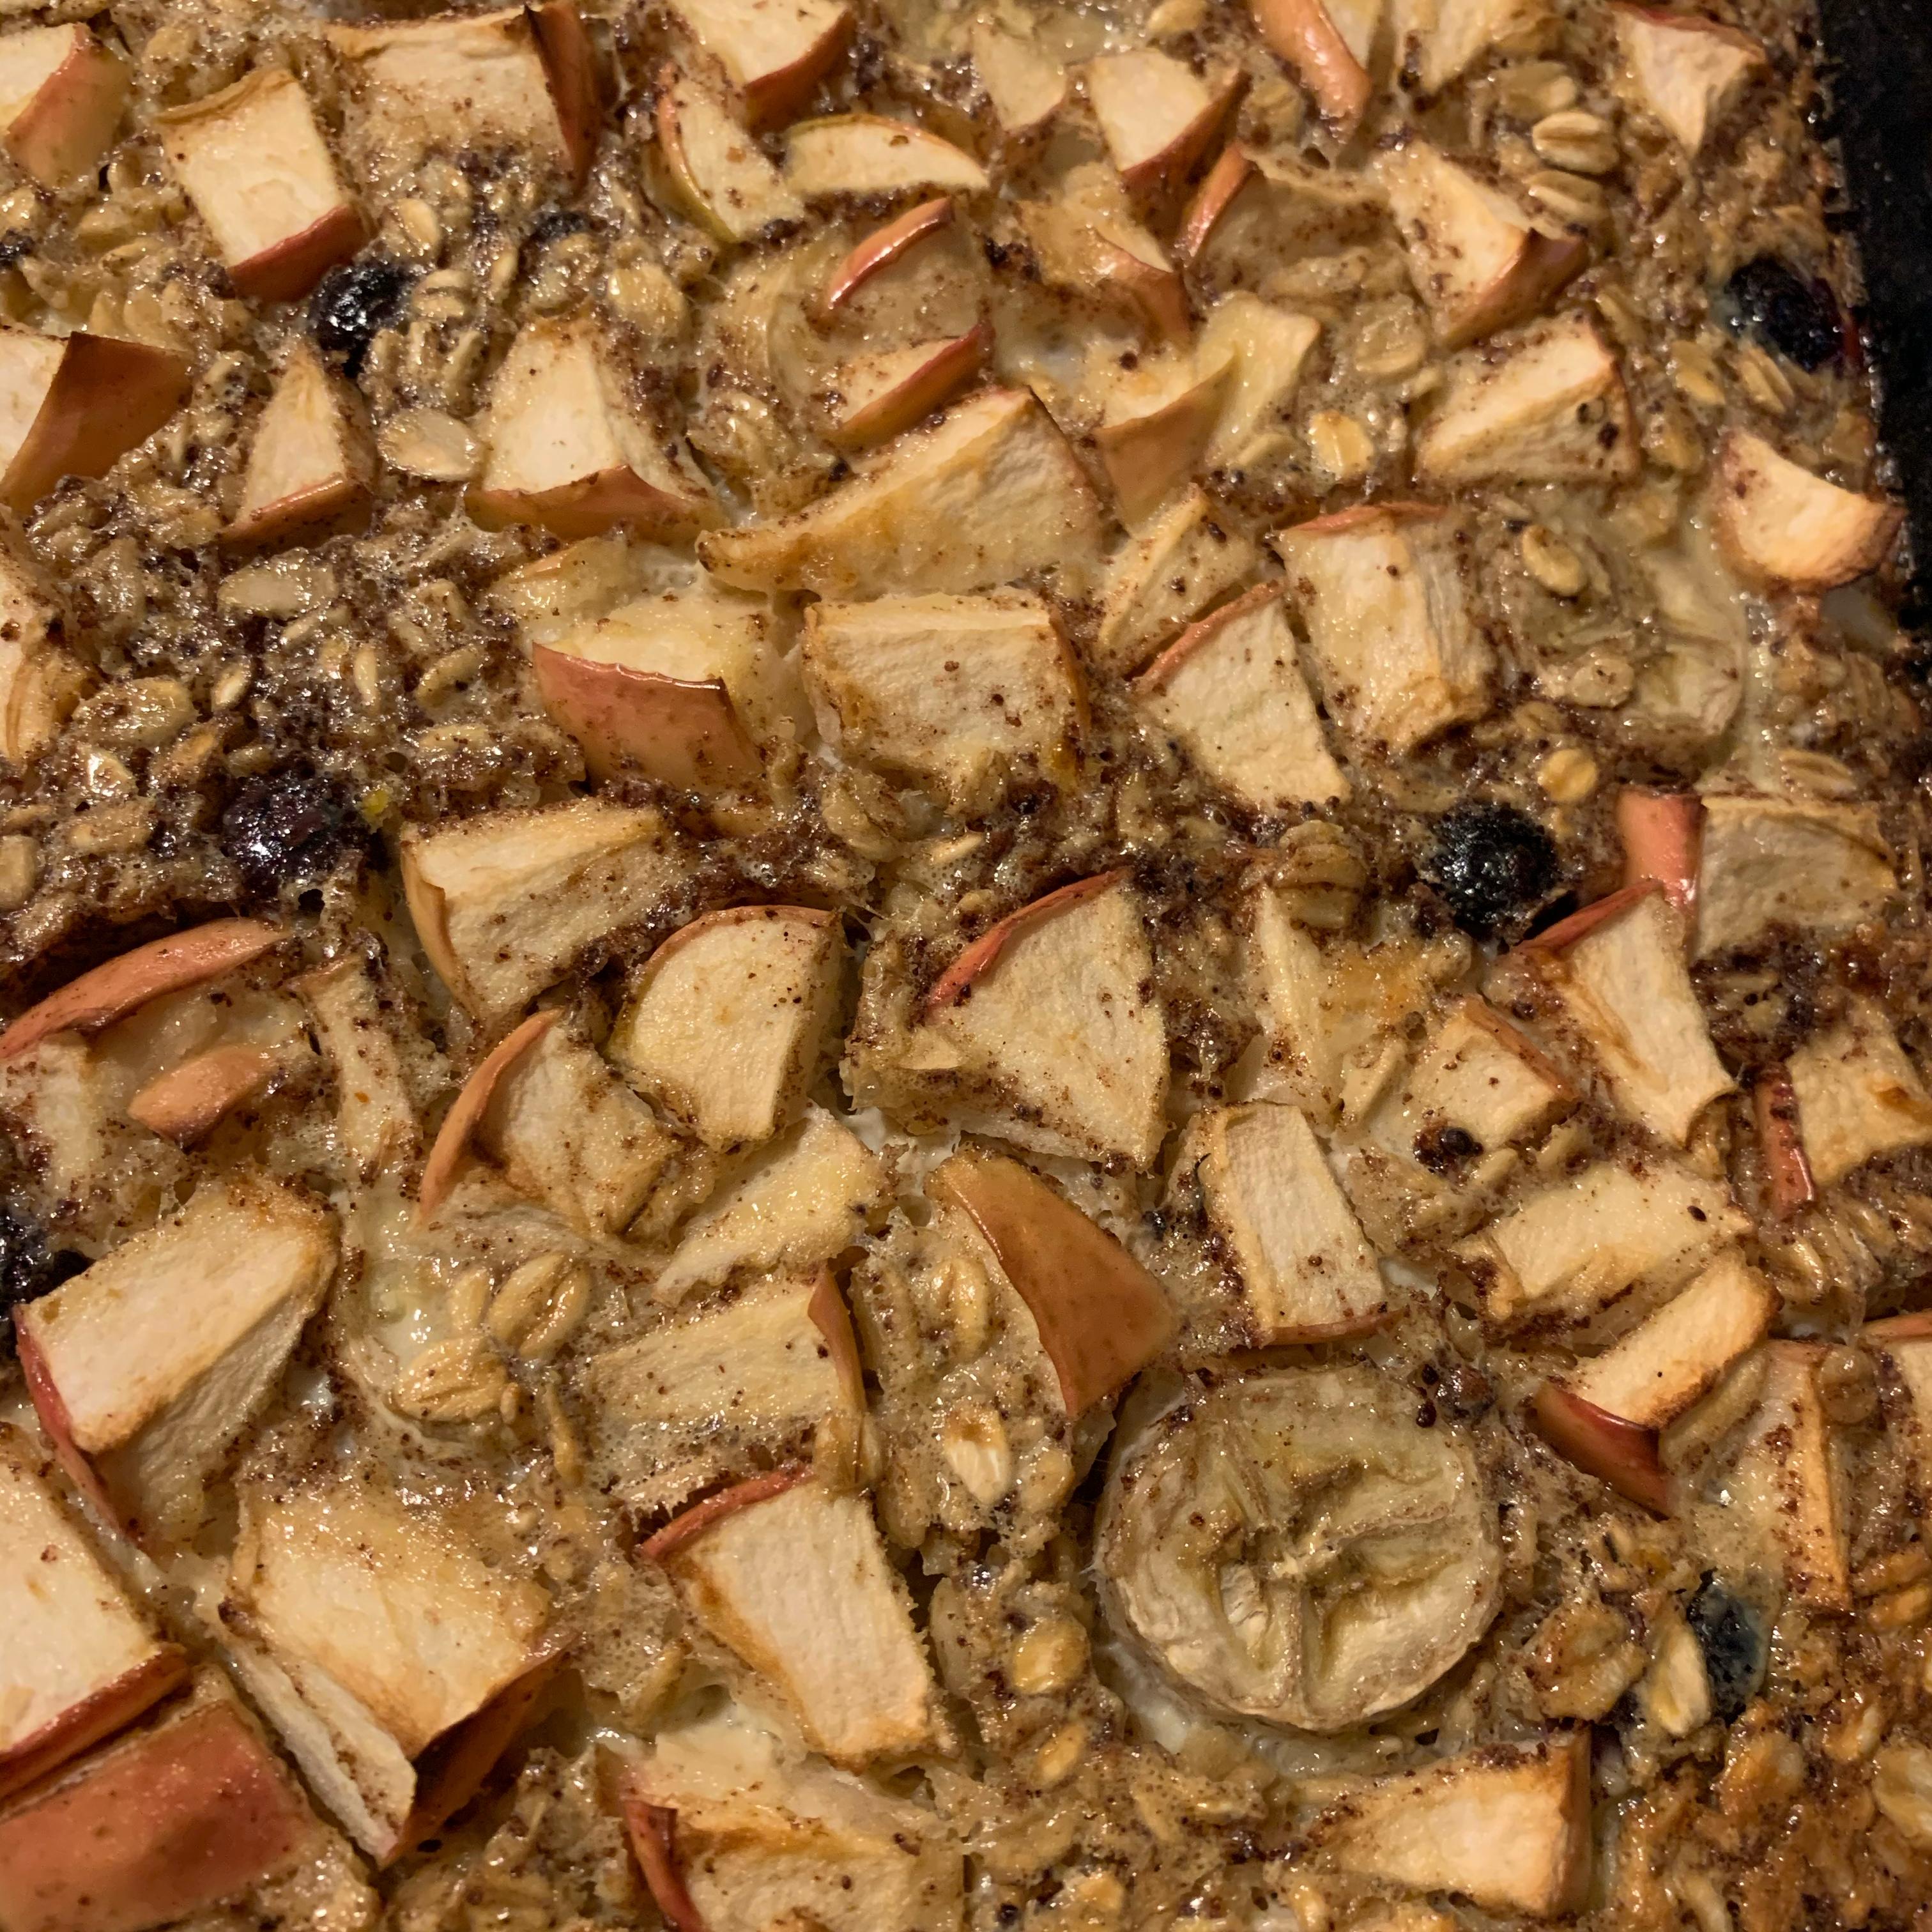 Baked Oatmeal with Cinnamon Ryan White